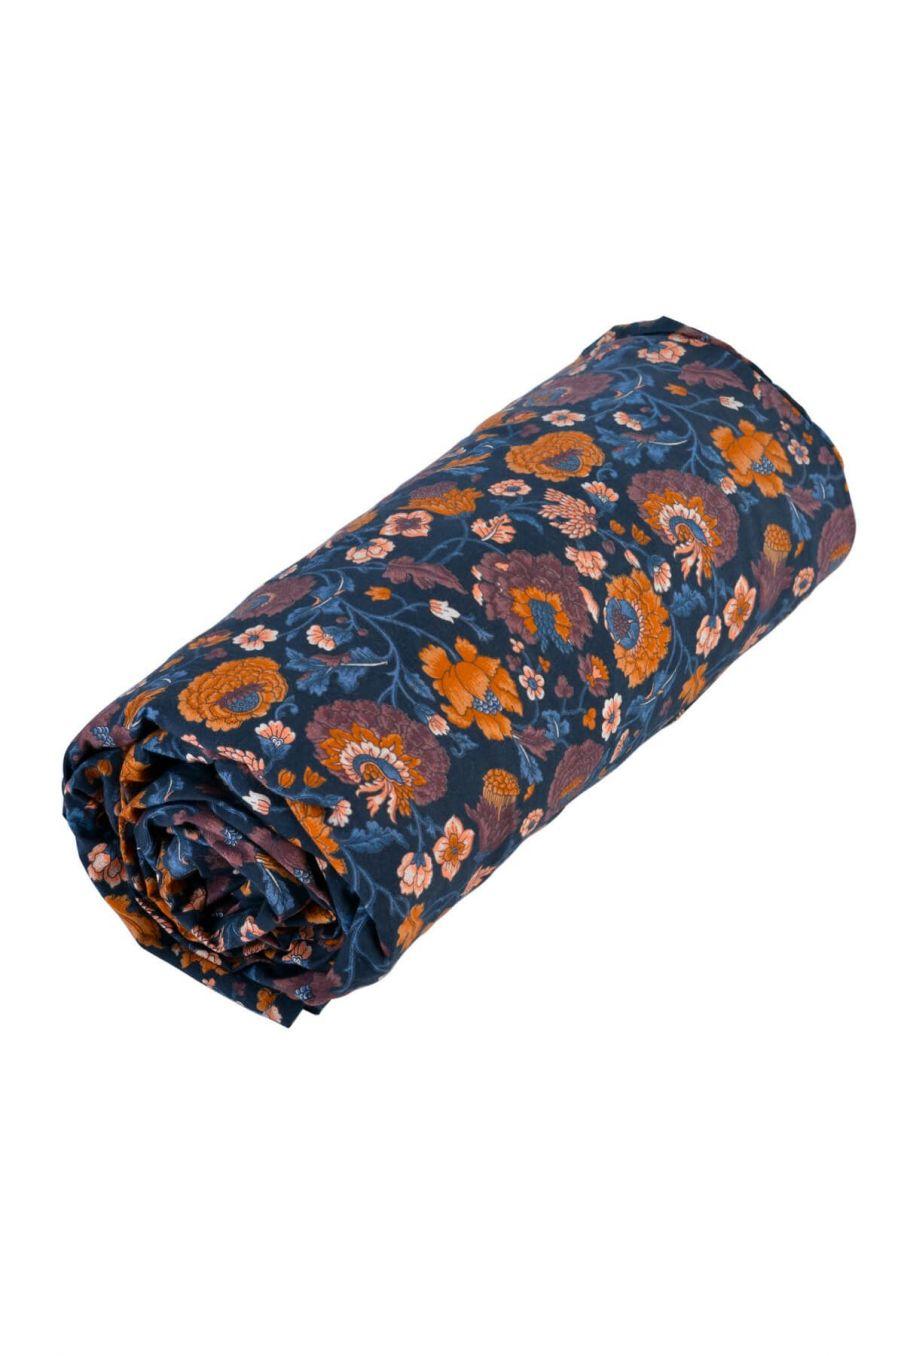 drap-housse maison nicole charcoal bohemian flowers - louise misha